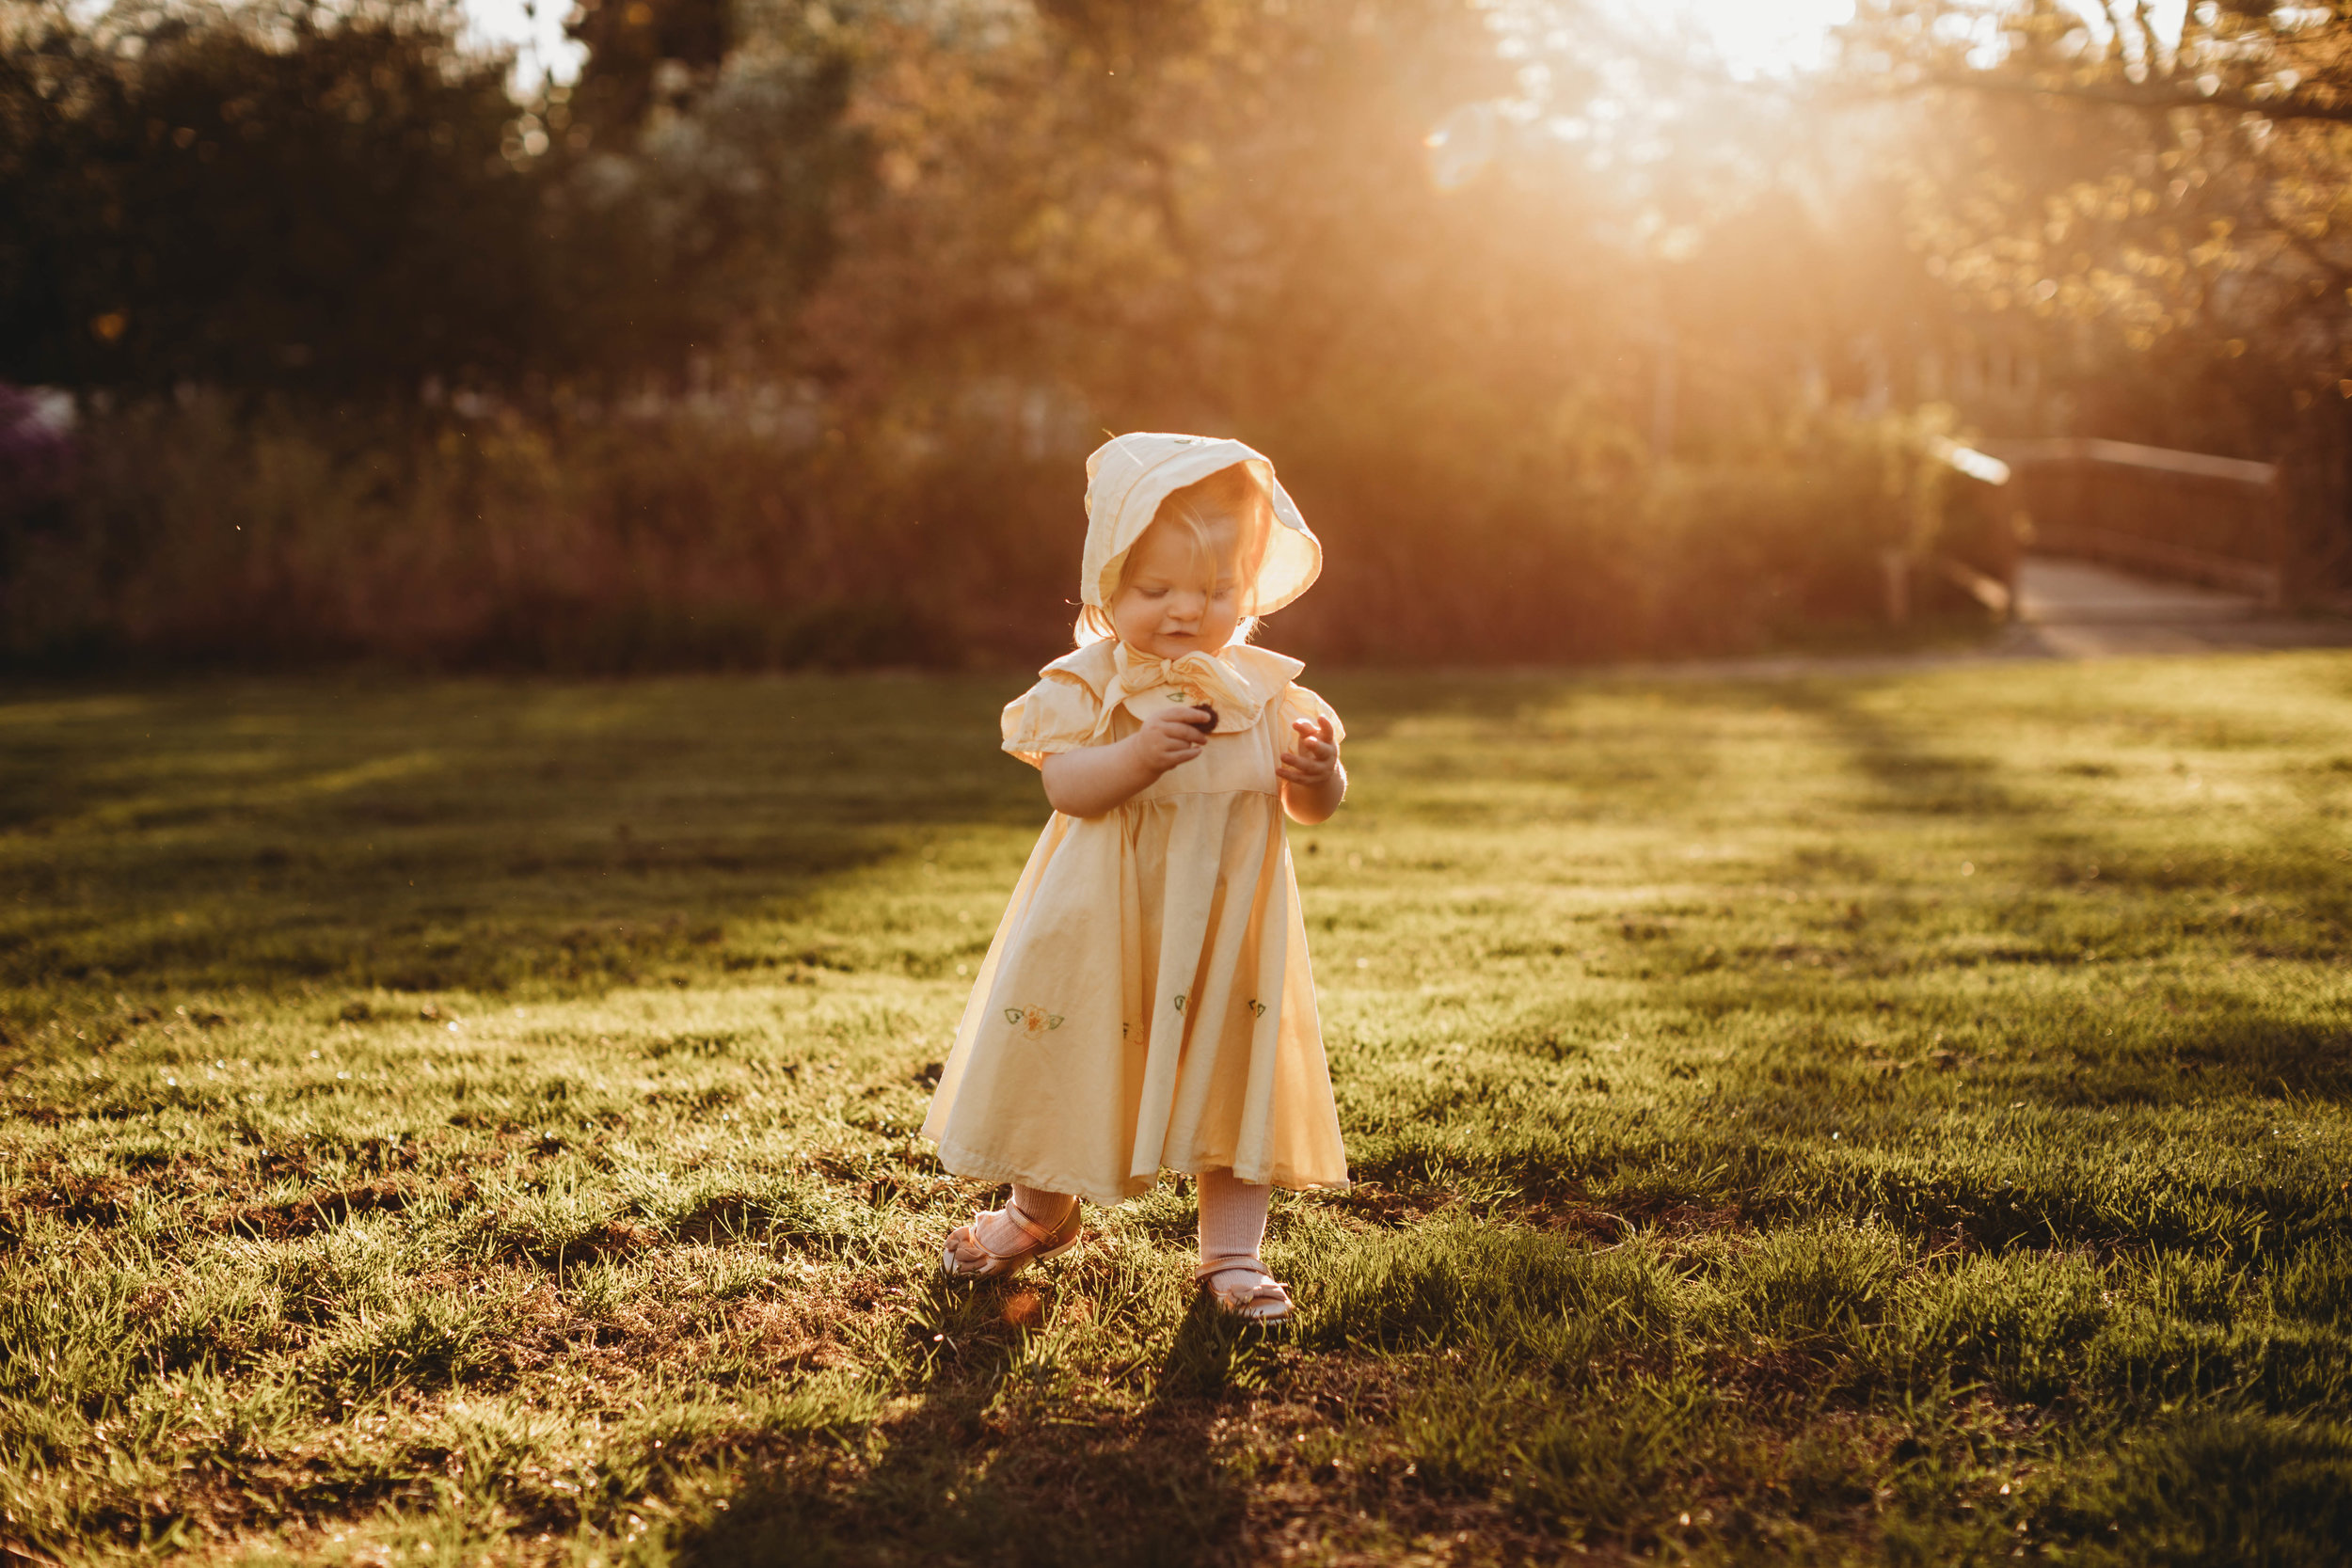 Wearing her great grandmother's baby gown. Golden hour toddler portraits. Acton Arboretum, Massachusetts.